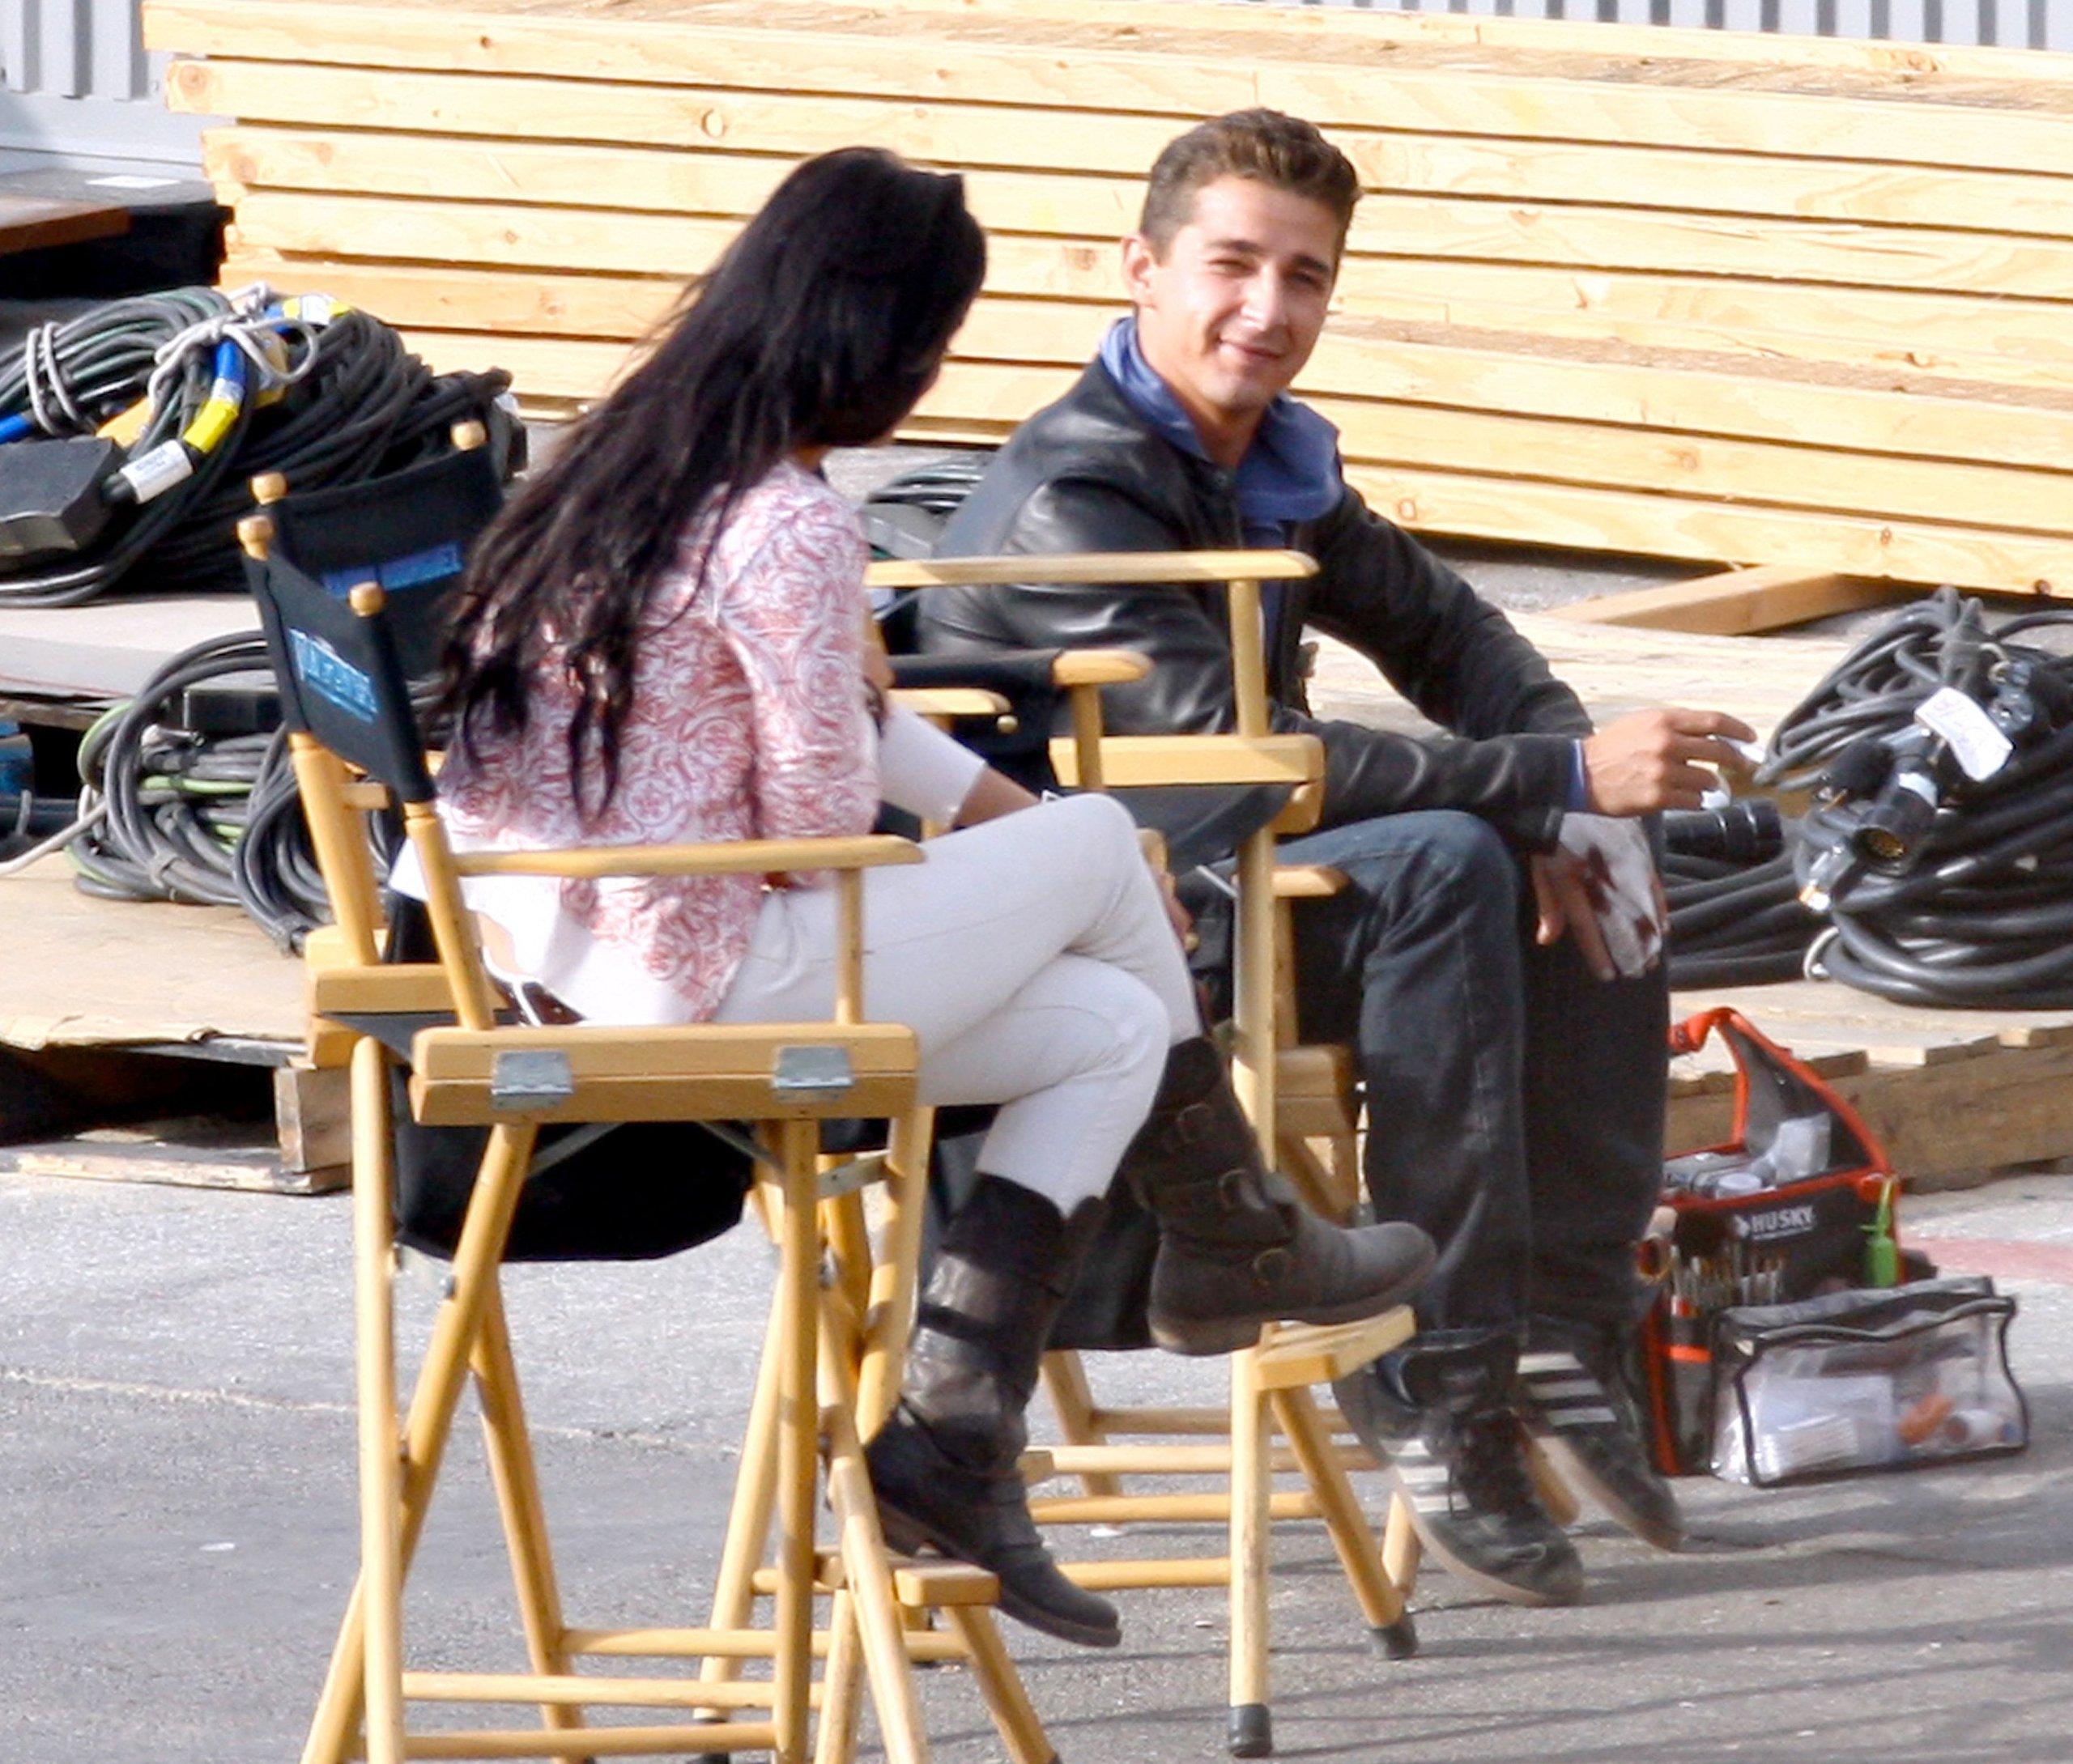 Derek jeter dating 2005